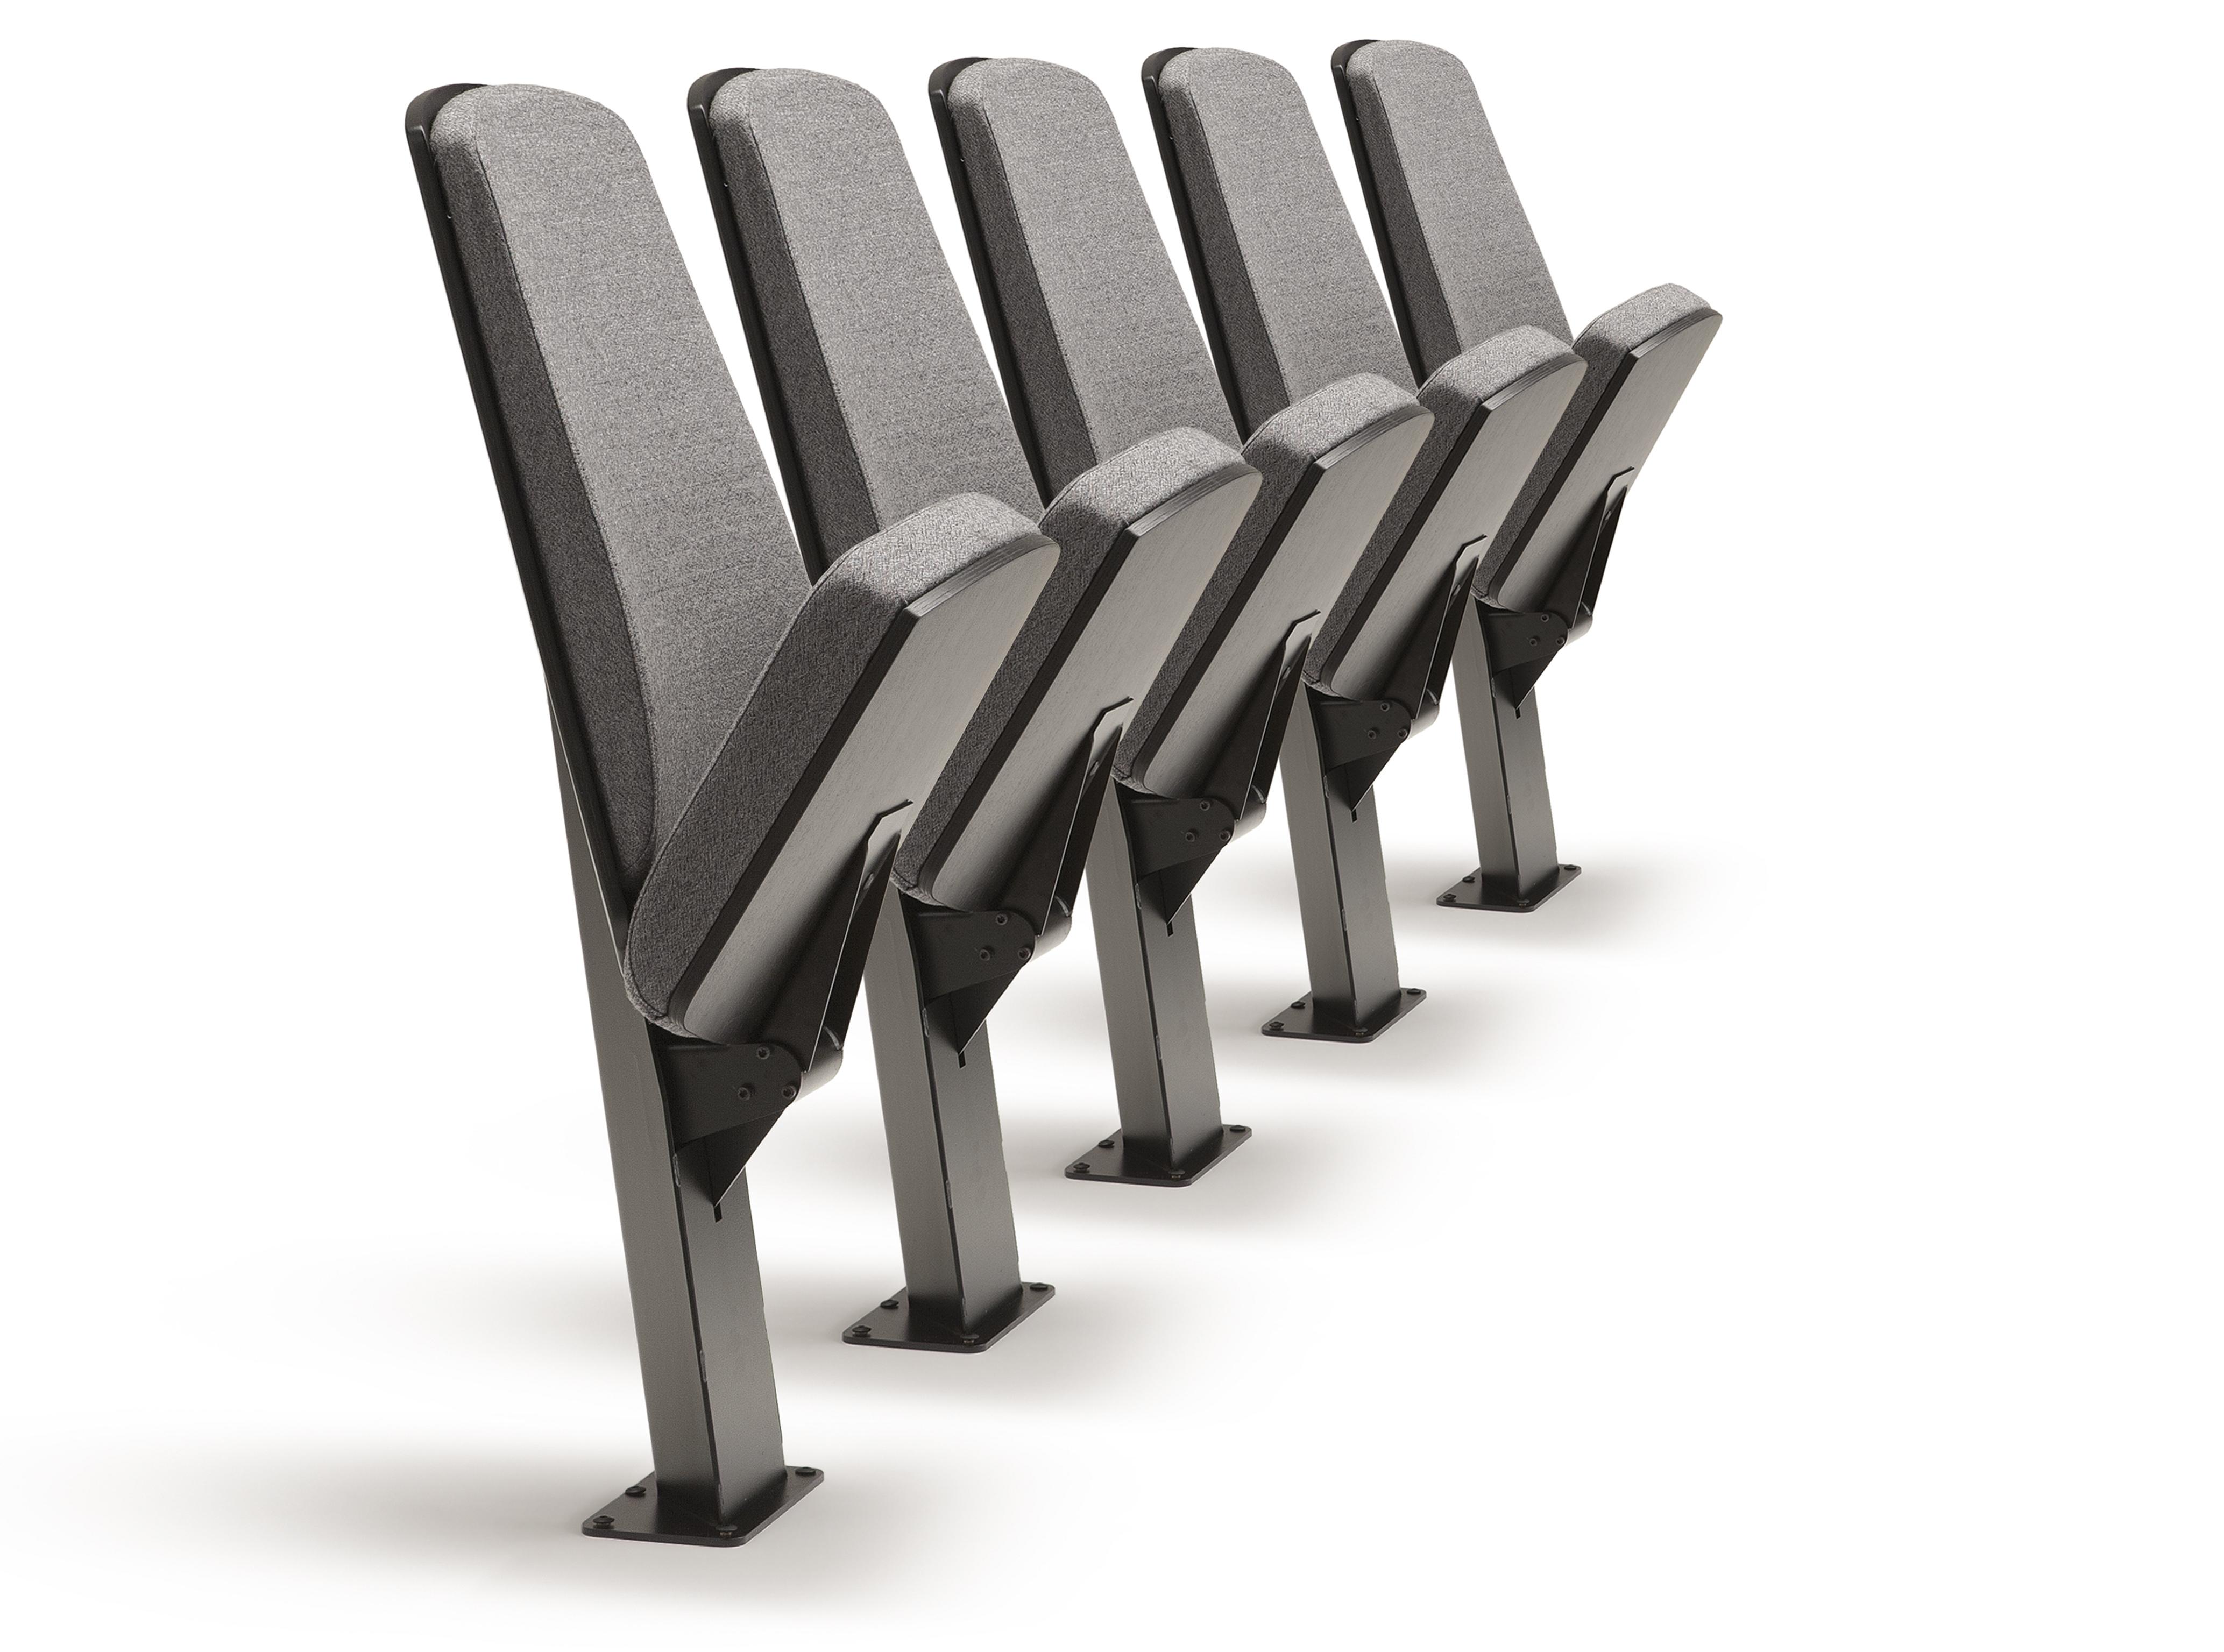 Pro Seat auditoriestol i rekke pos Fora Form